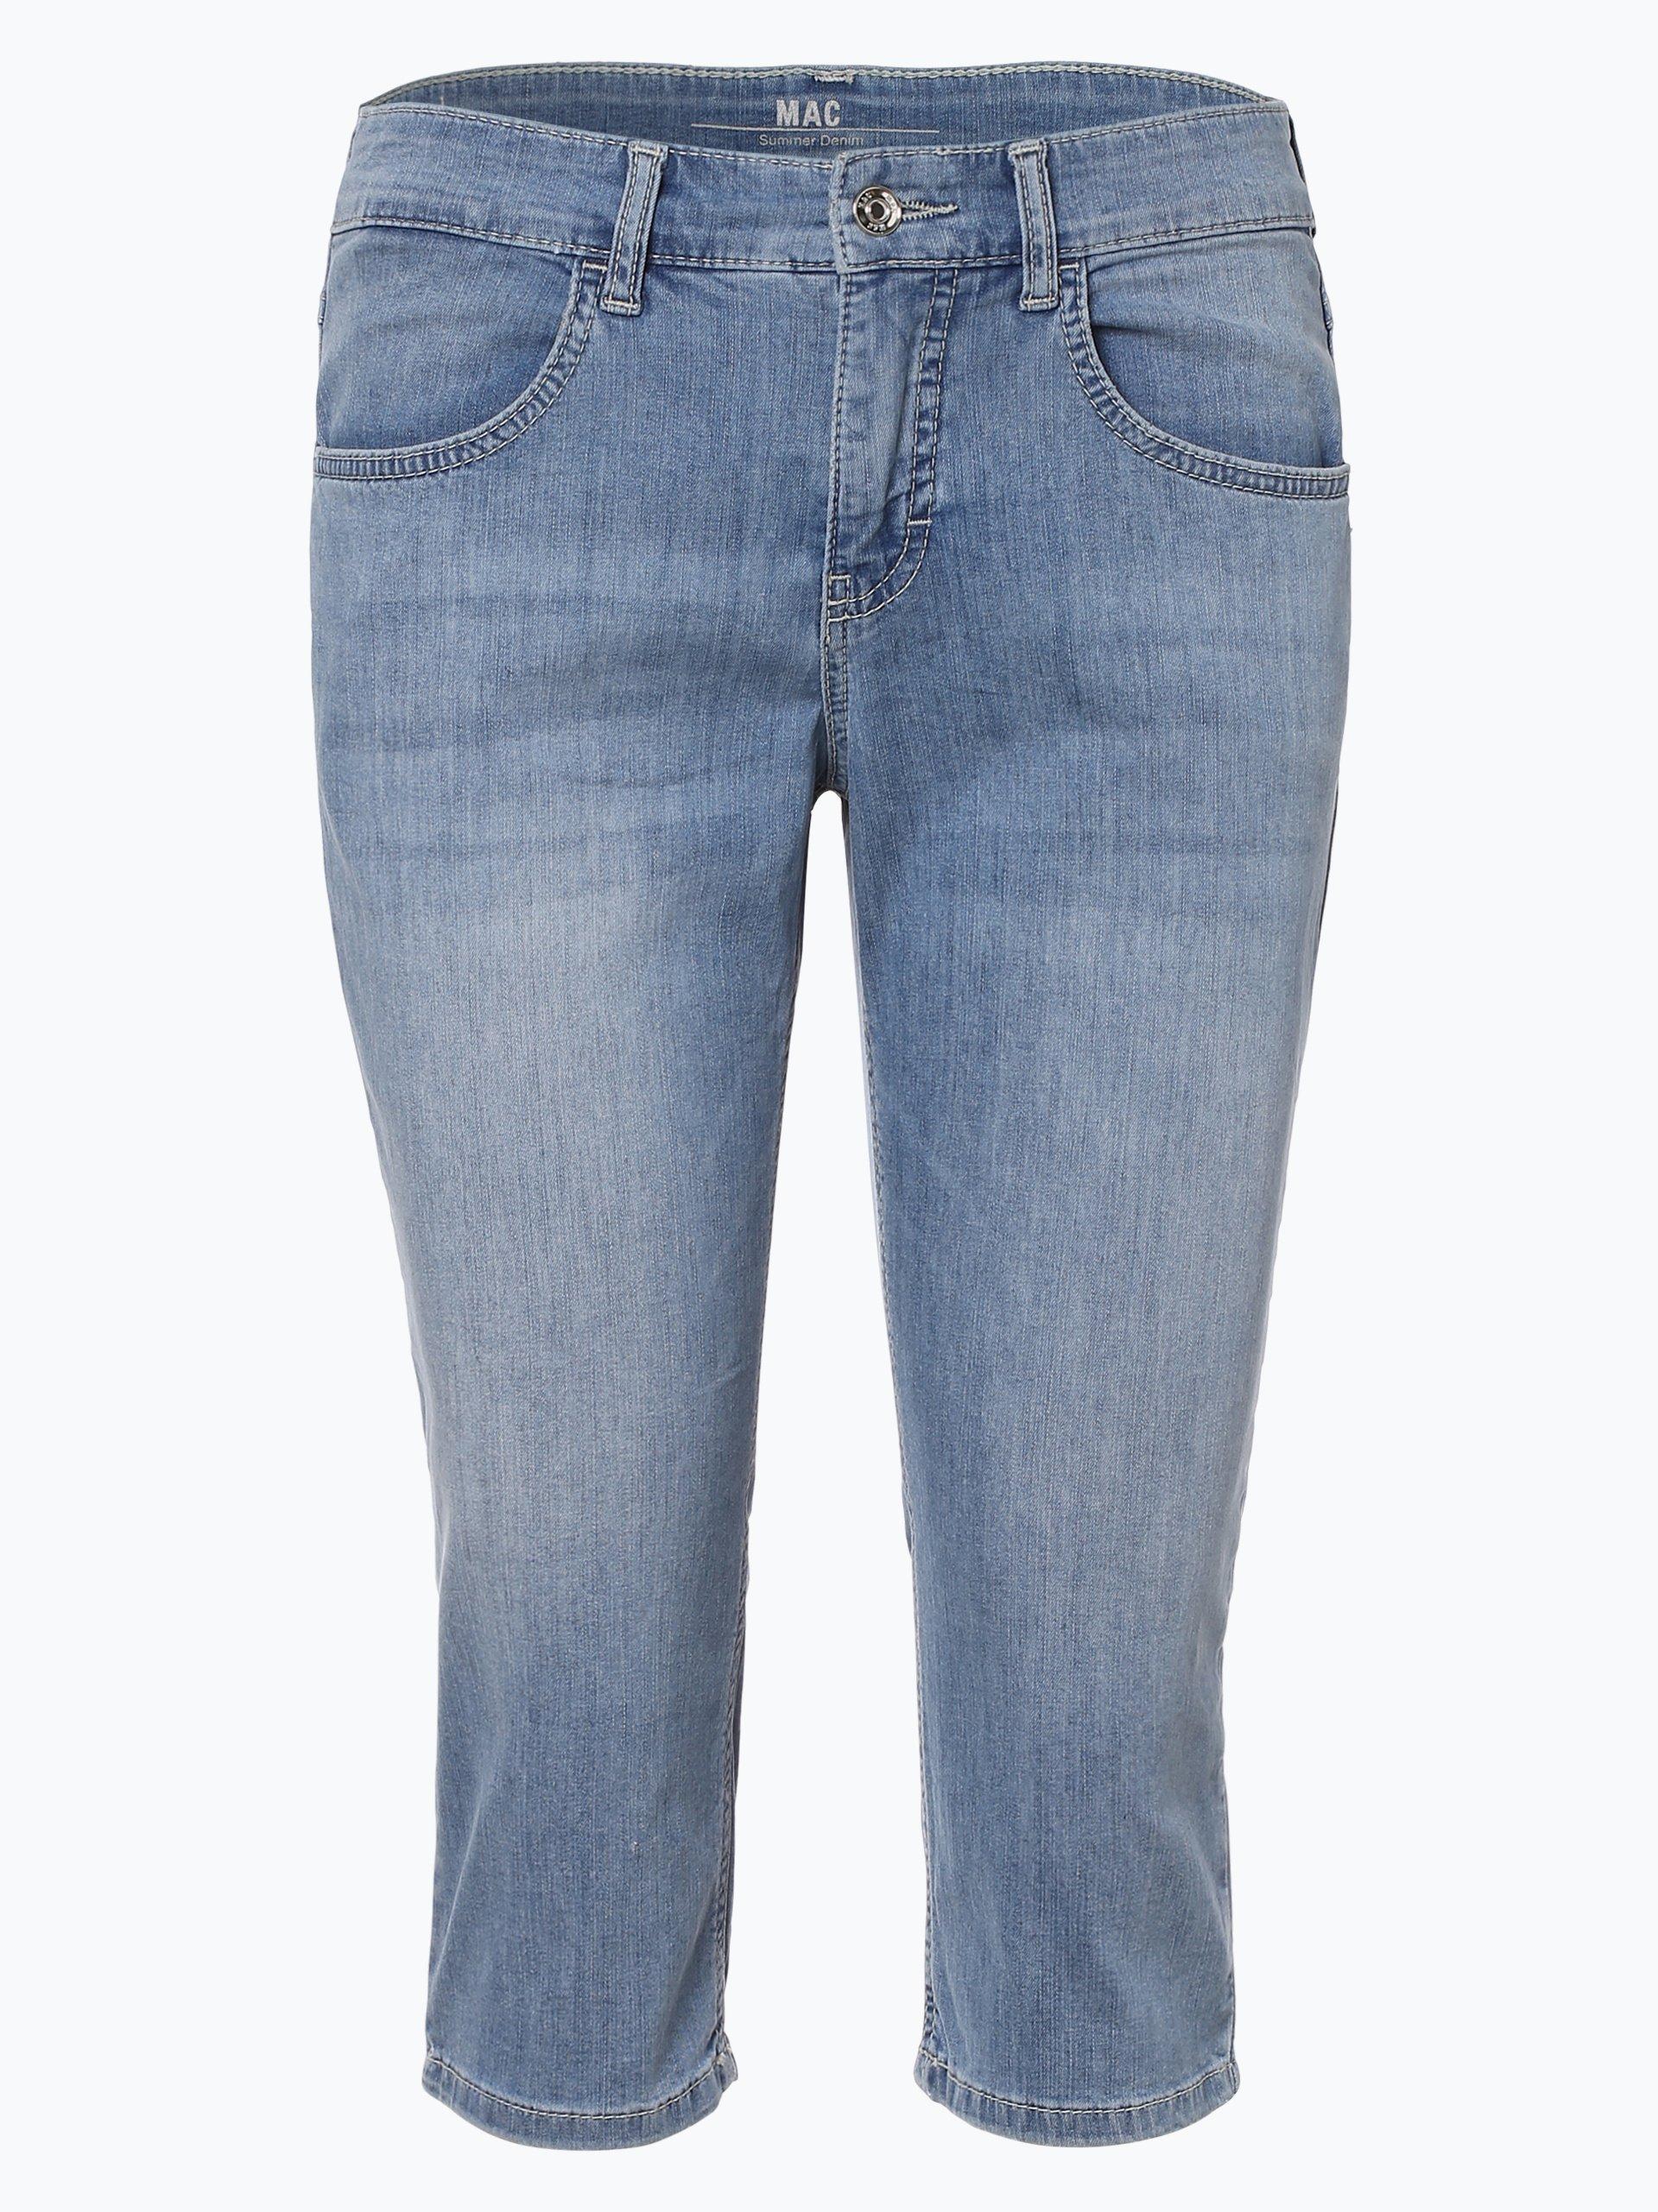 MAC Damen Jeans - Summer Clean